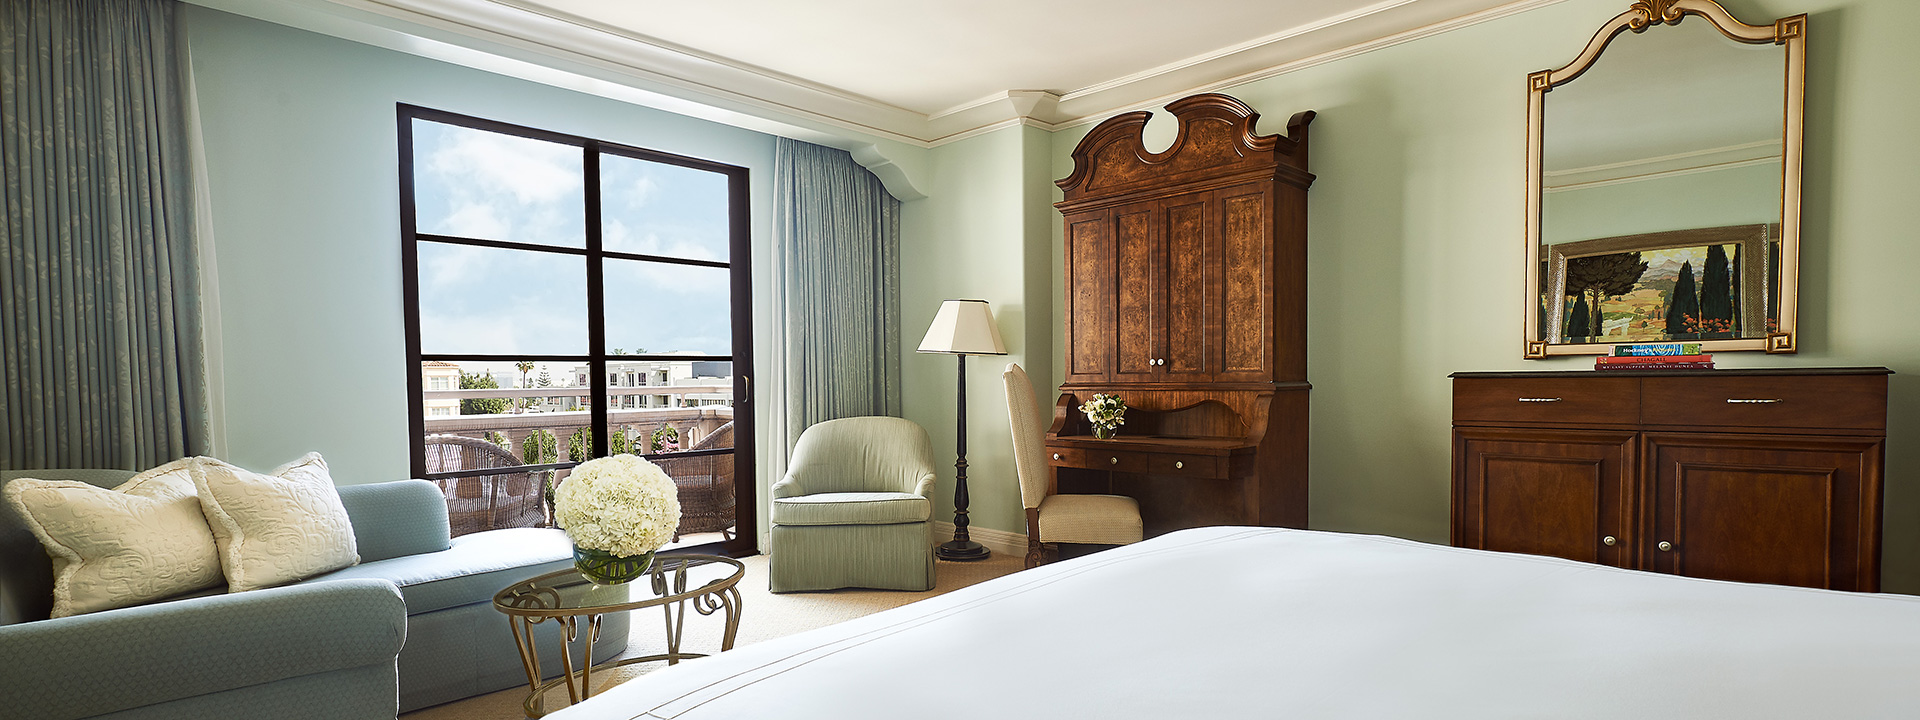 Premier Balcony King Room bedroom view